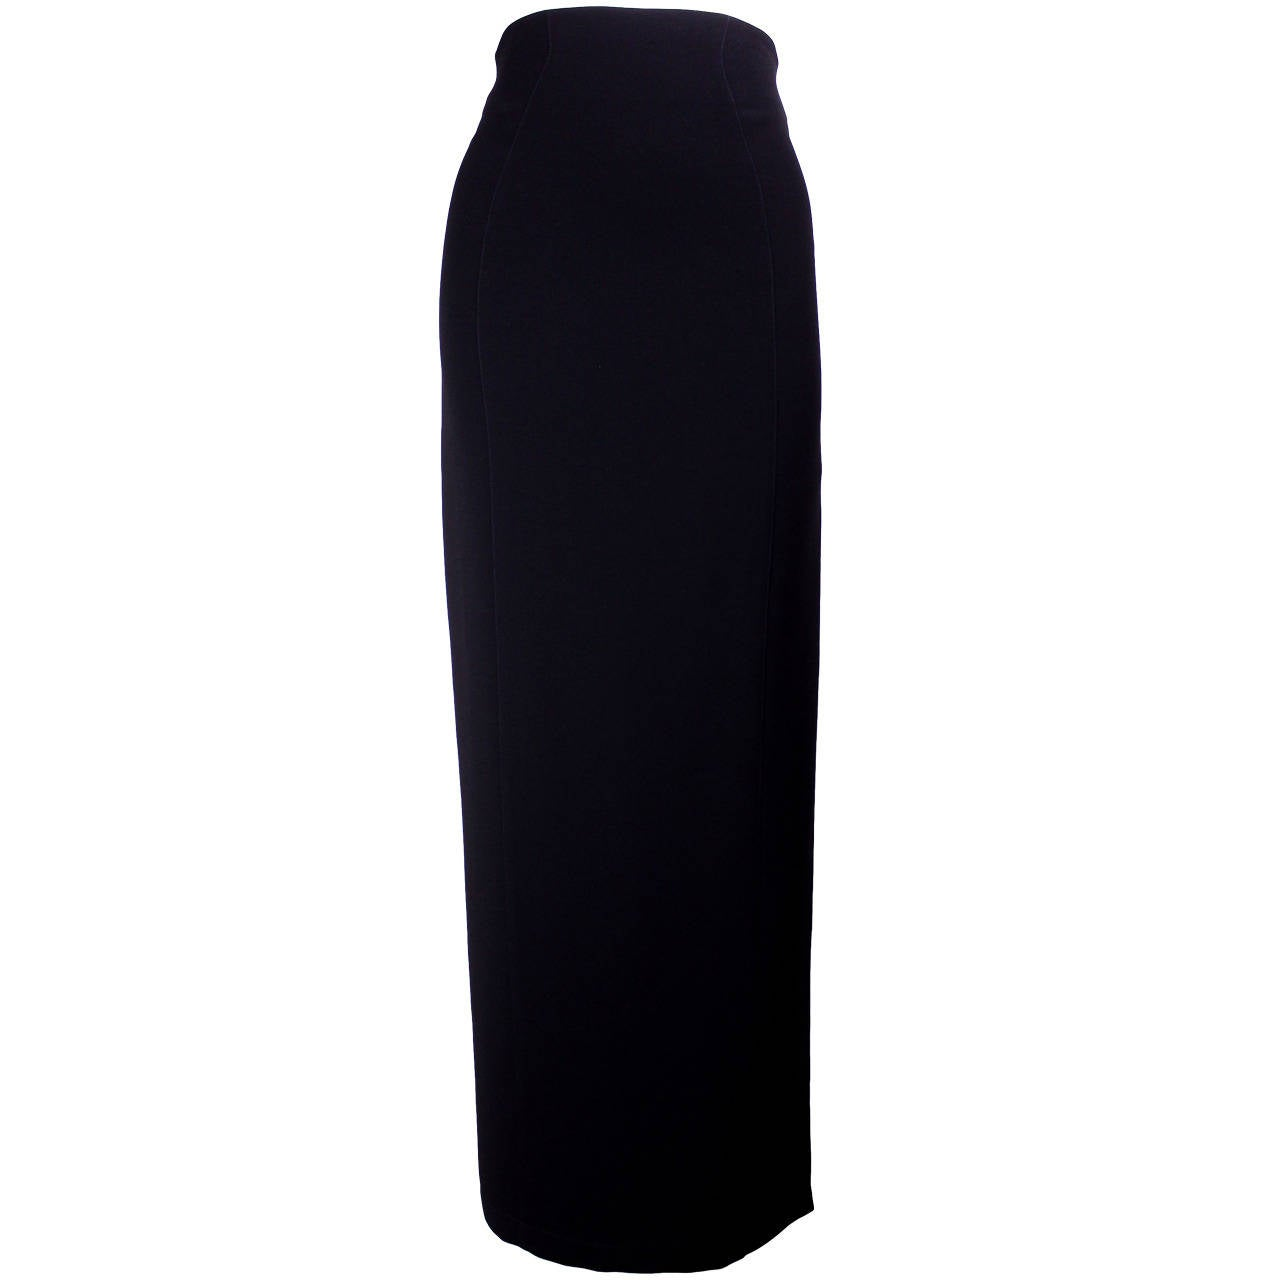 1980s Thierry Mugler Sexy Long Pencil Skirt 1